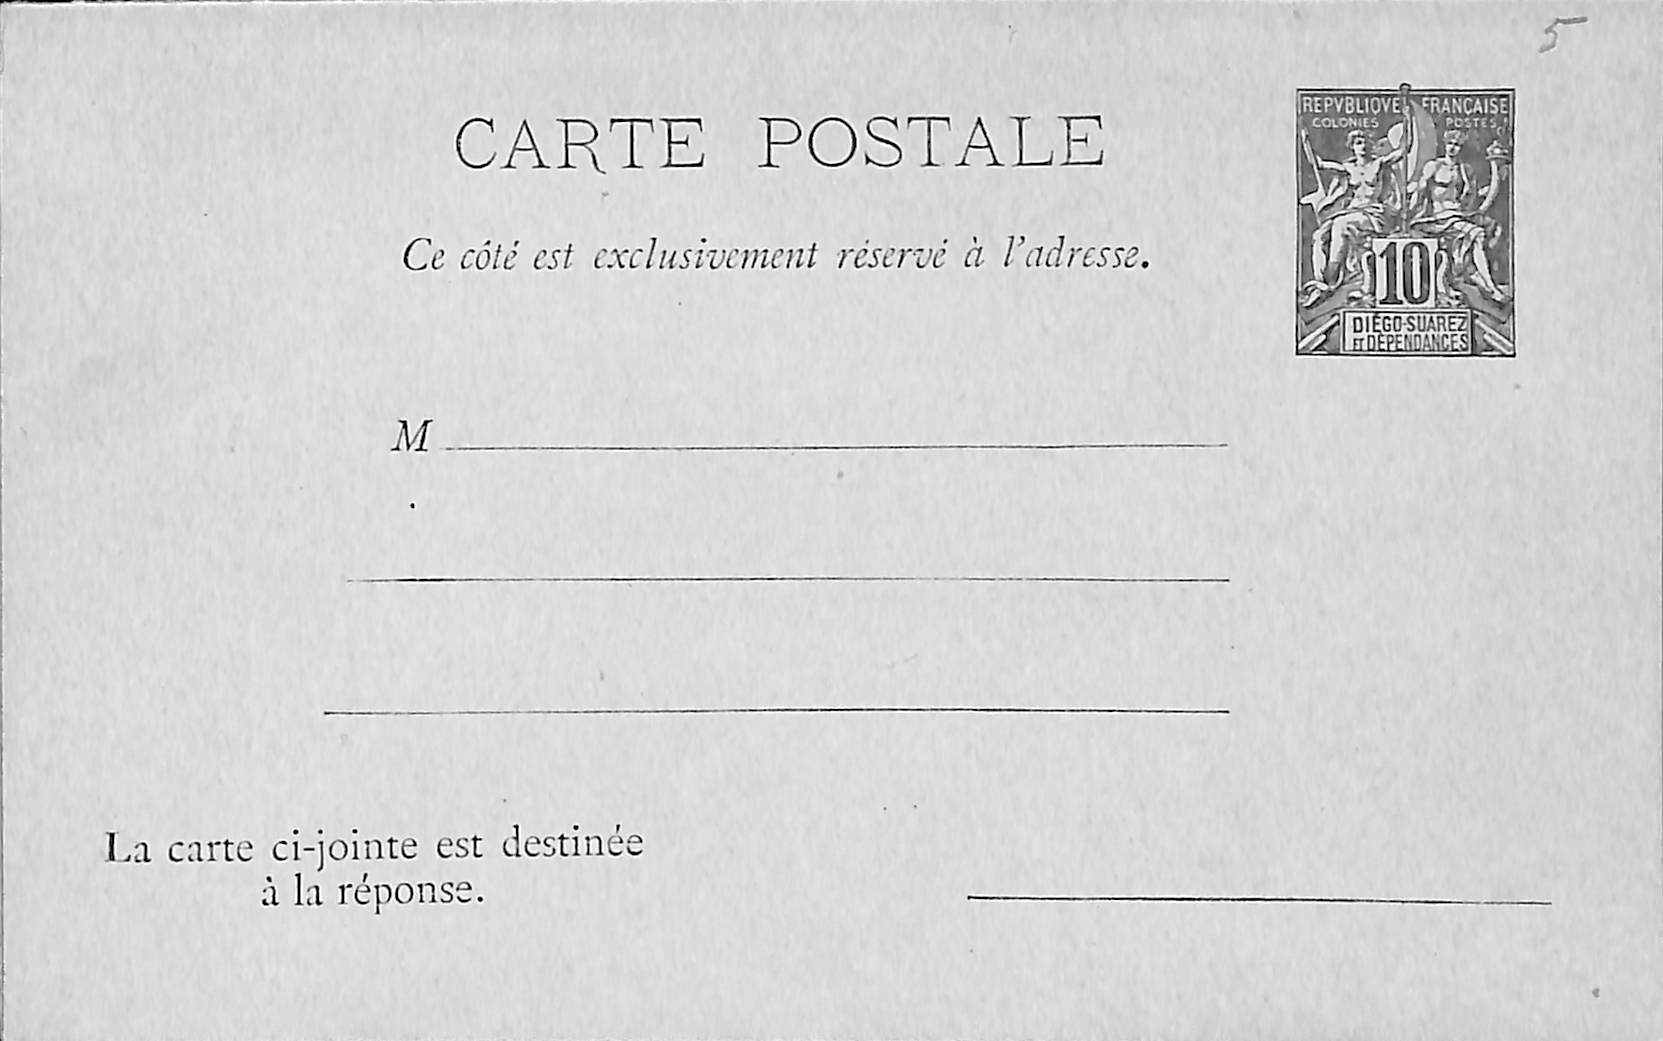 Diego Suarez, Reply Paid Postcard 10/10c